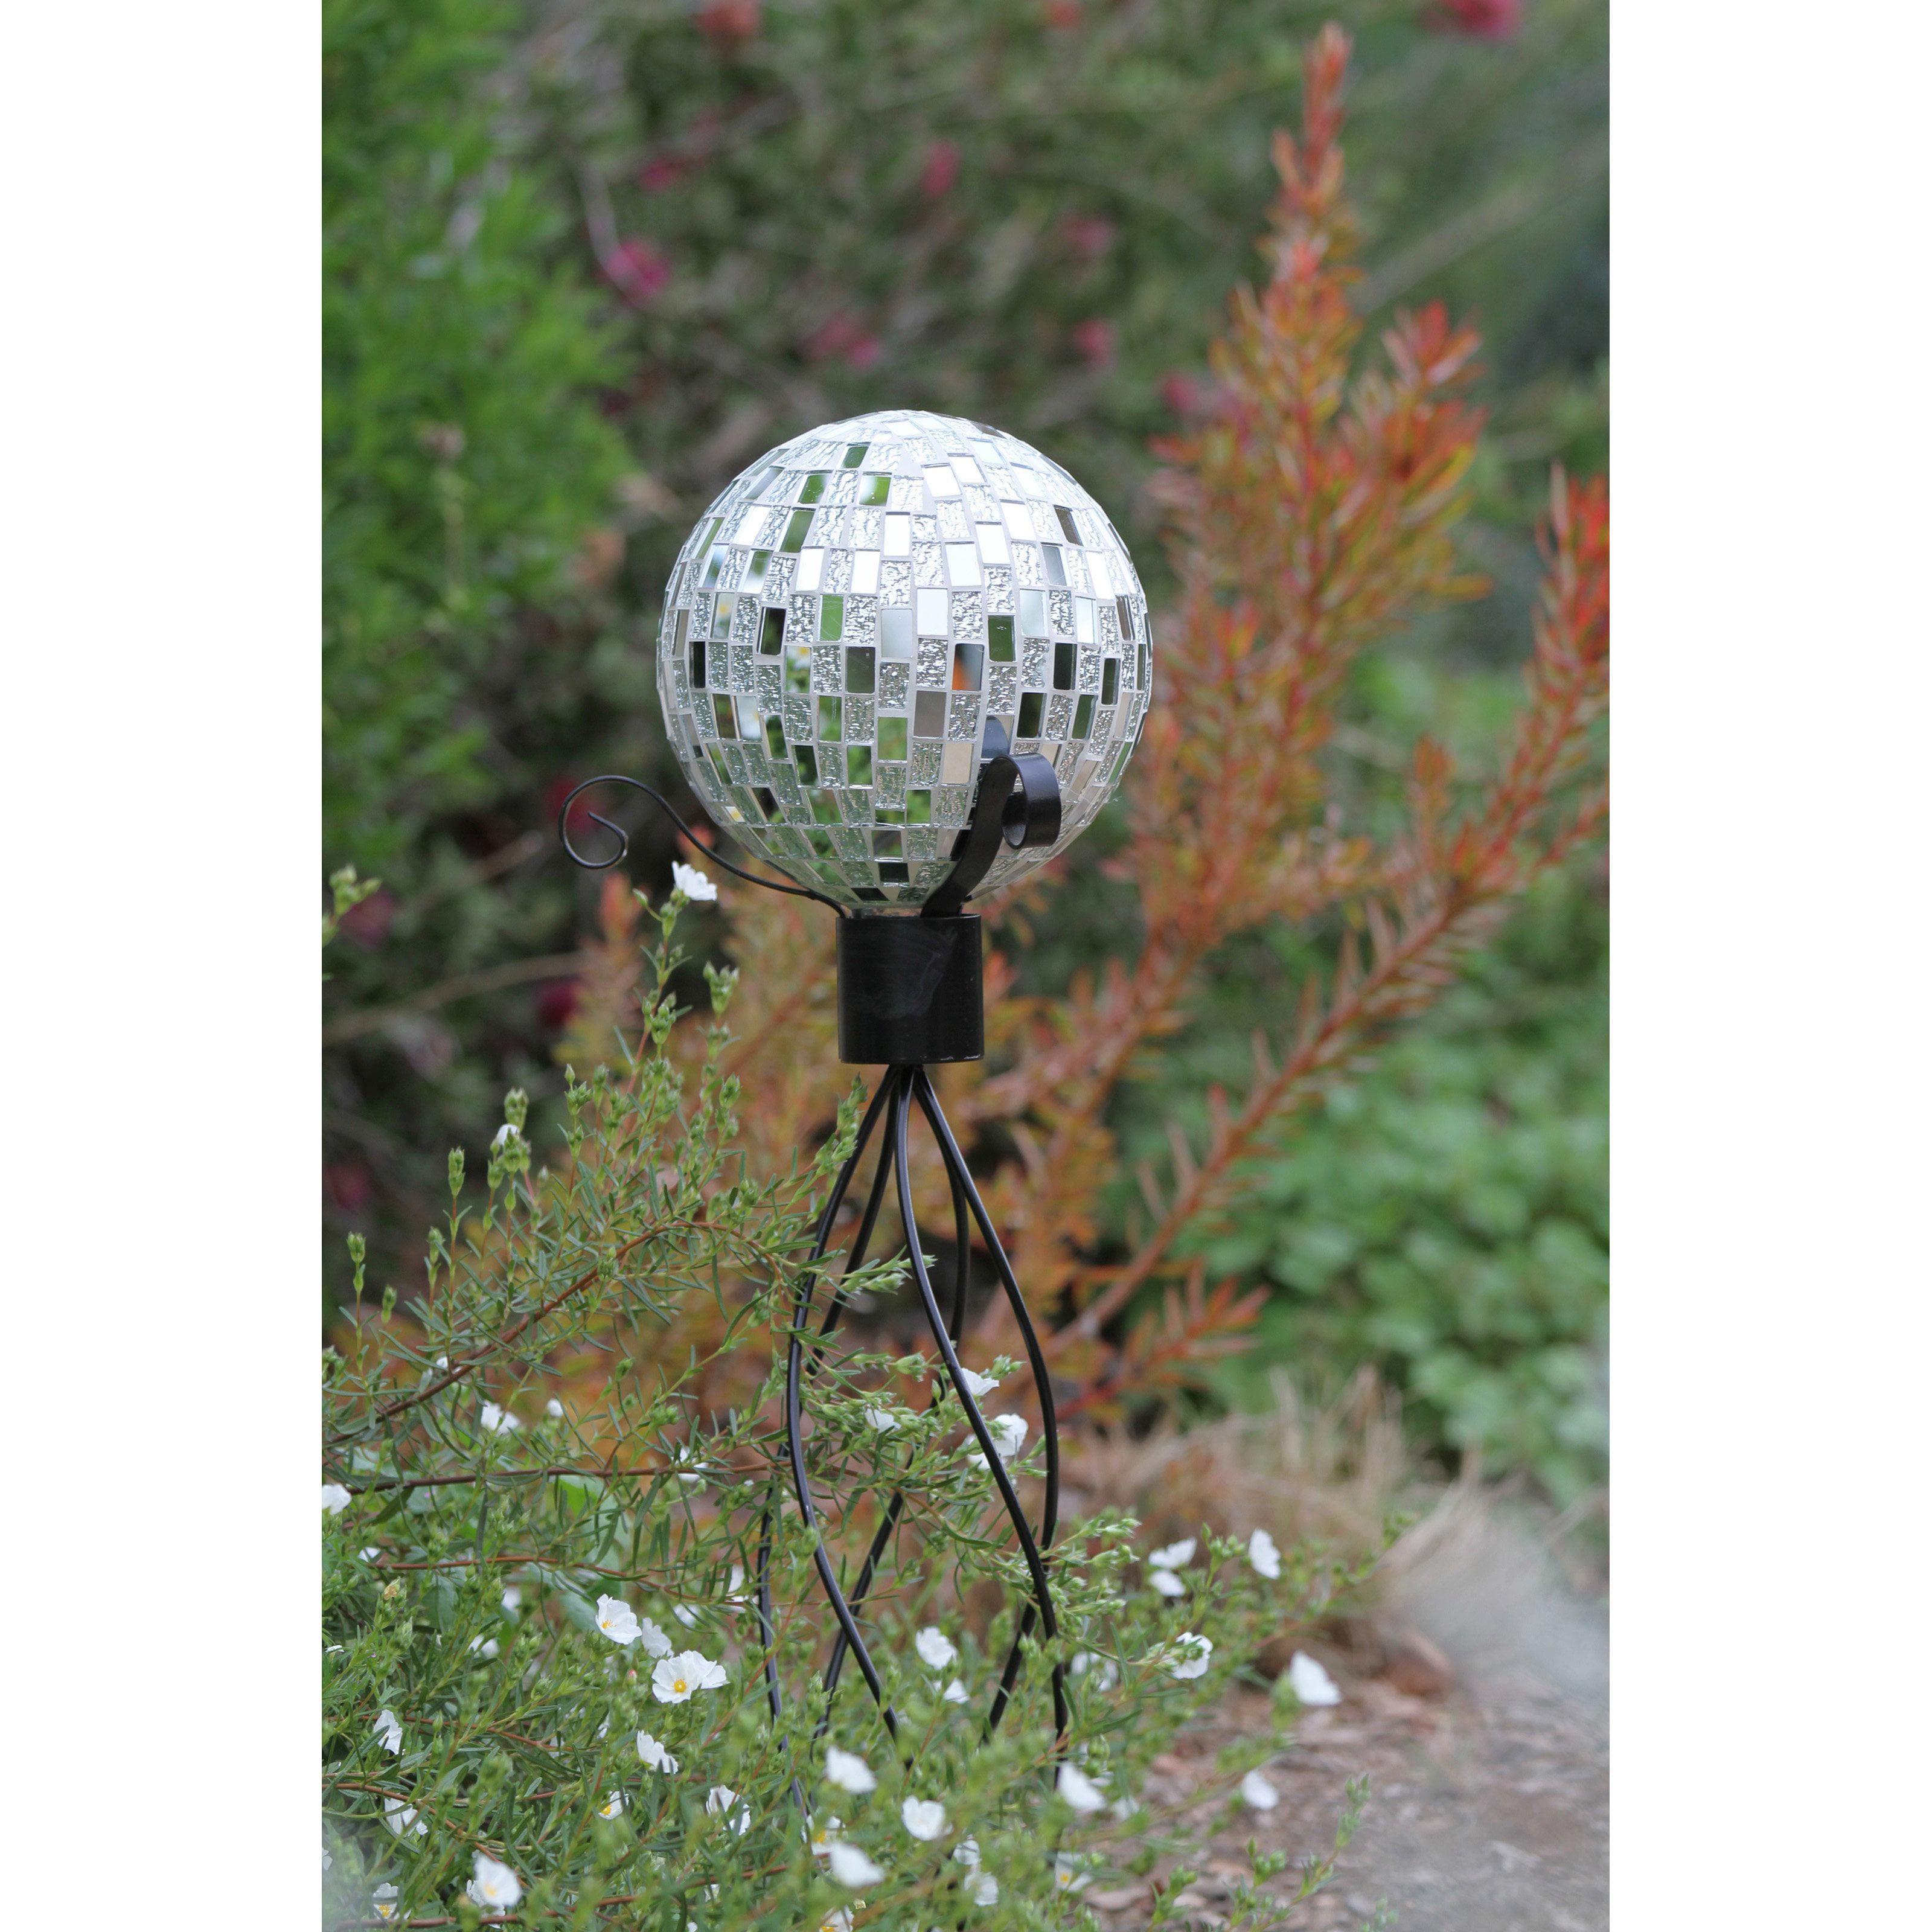 Mosaic Silver Gazing Ball by Alpine Corporation